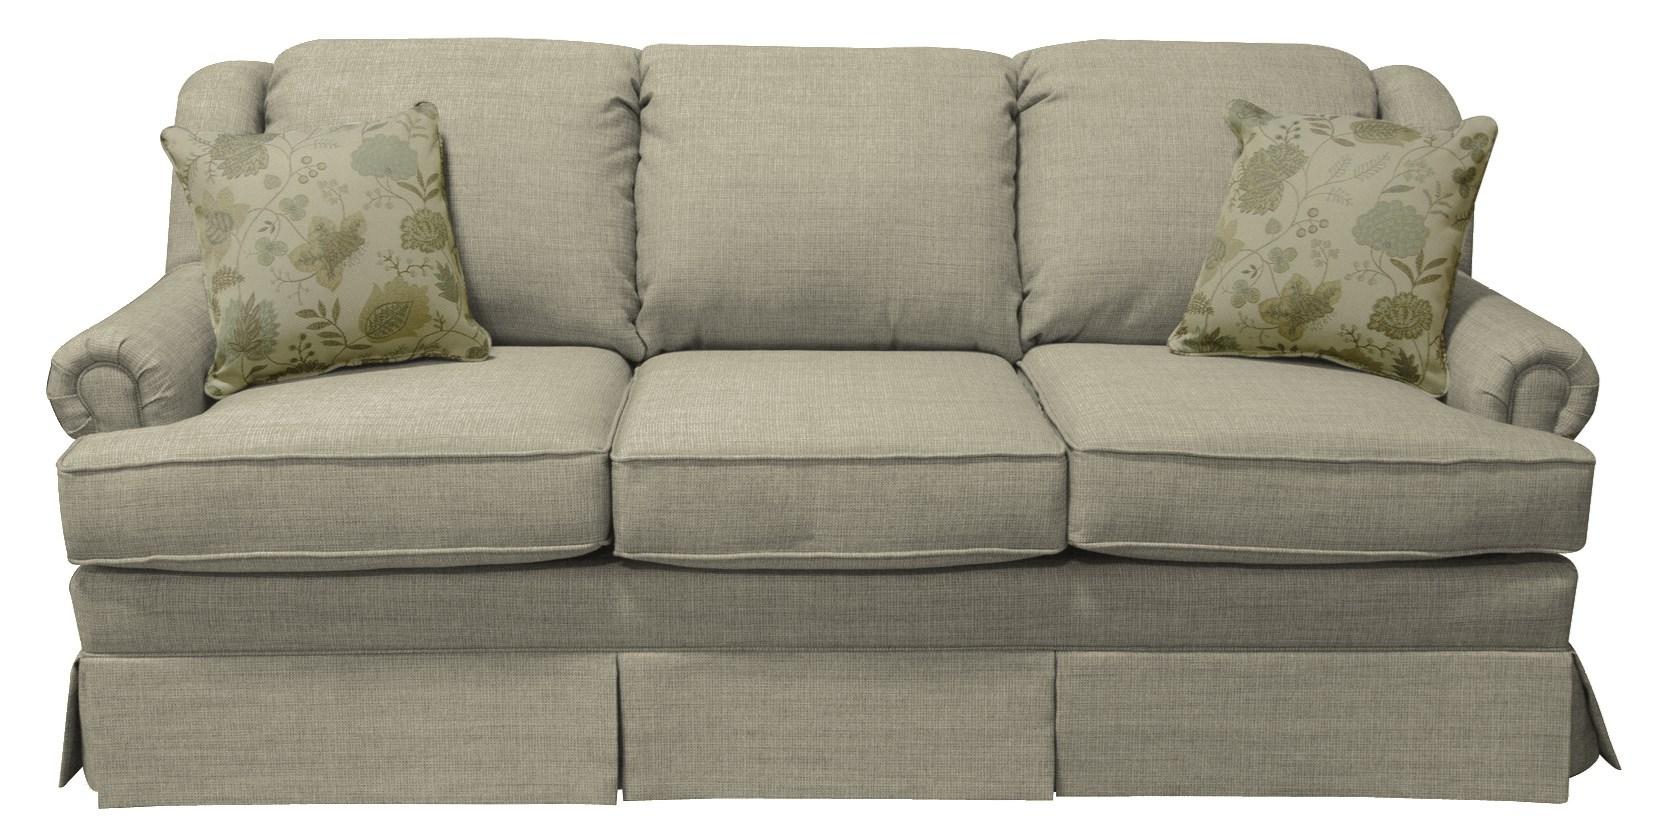 England RochelleSofa Sleeper With Comfort 3 Mattress